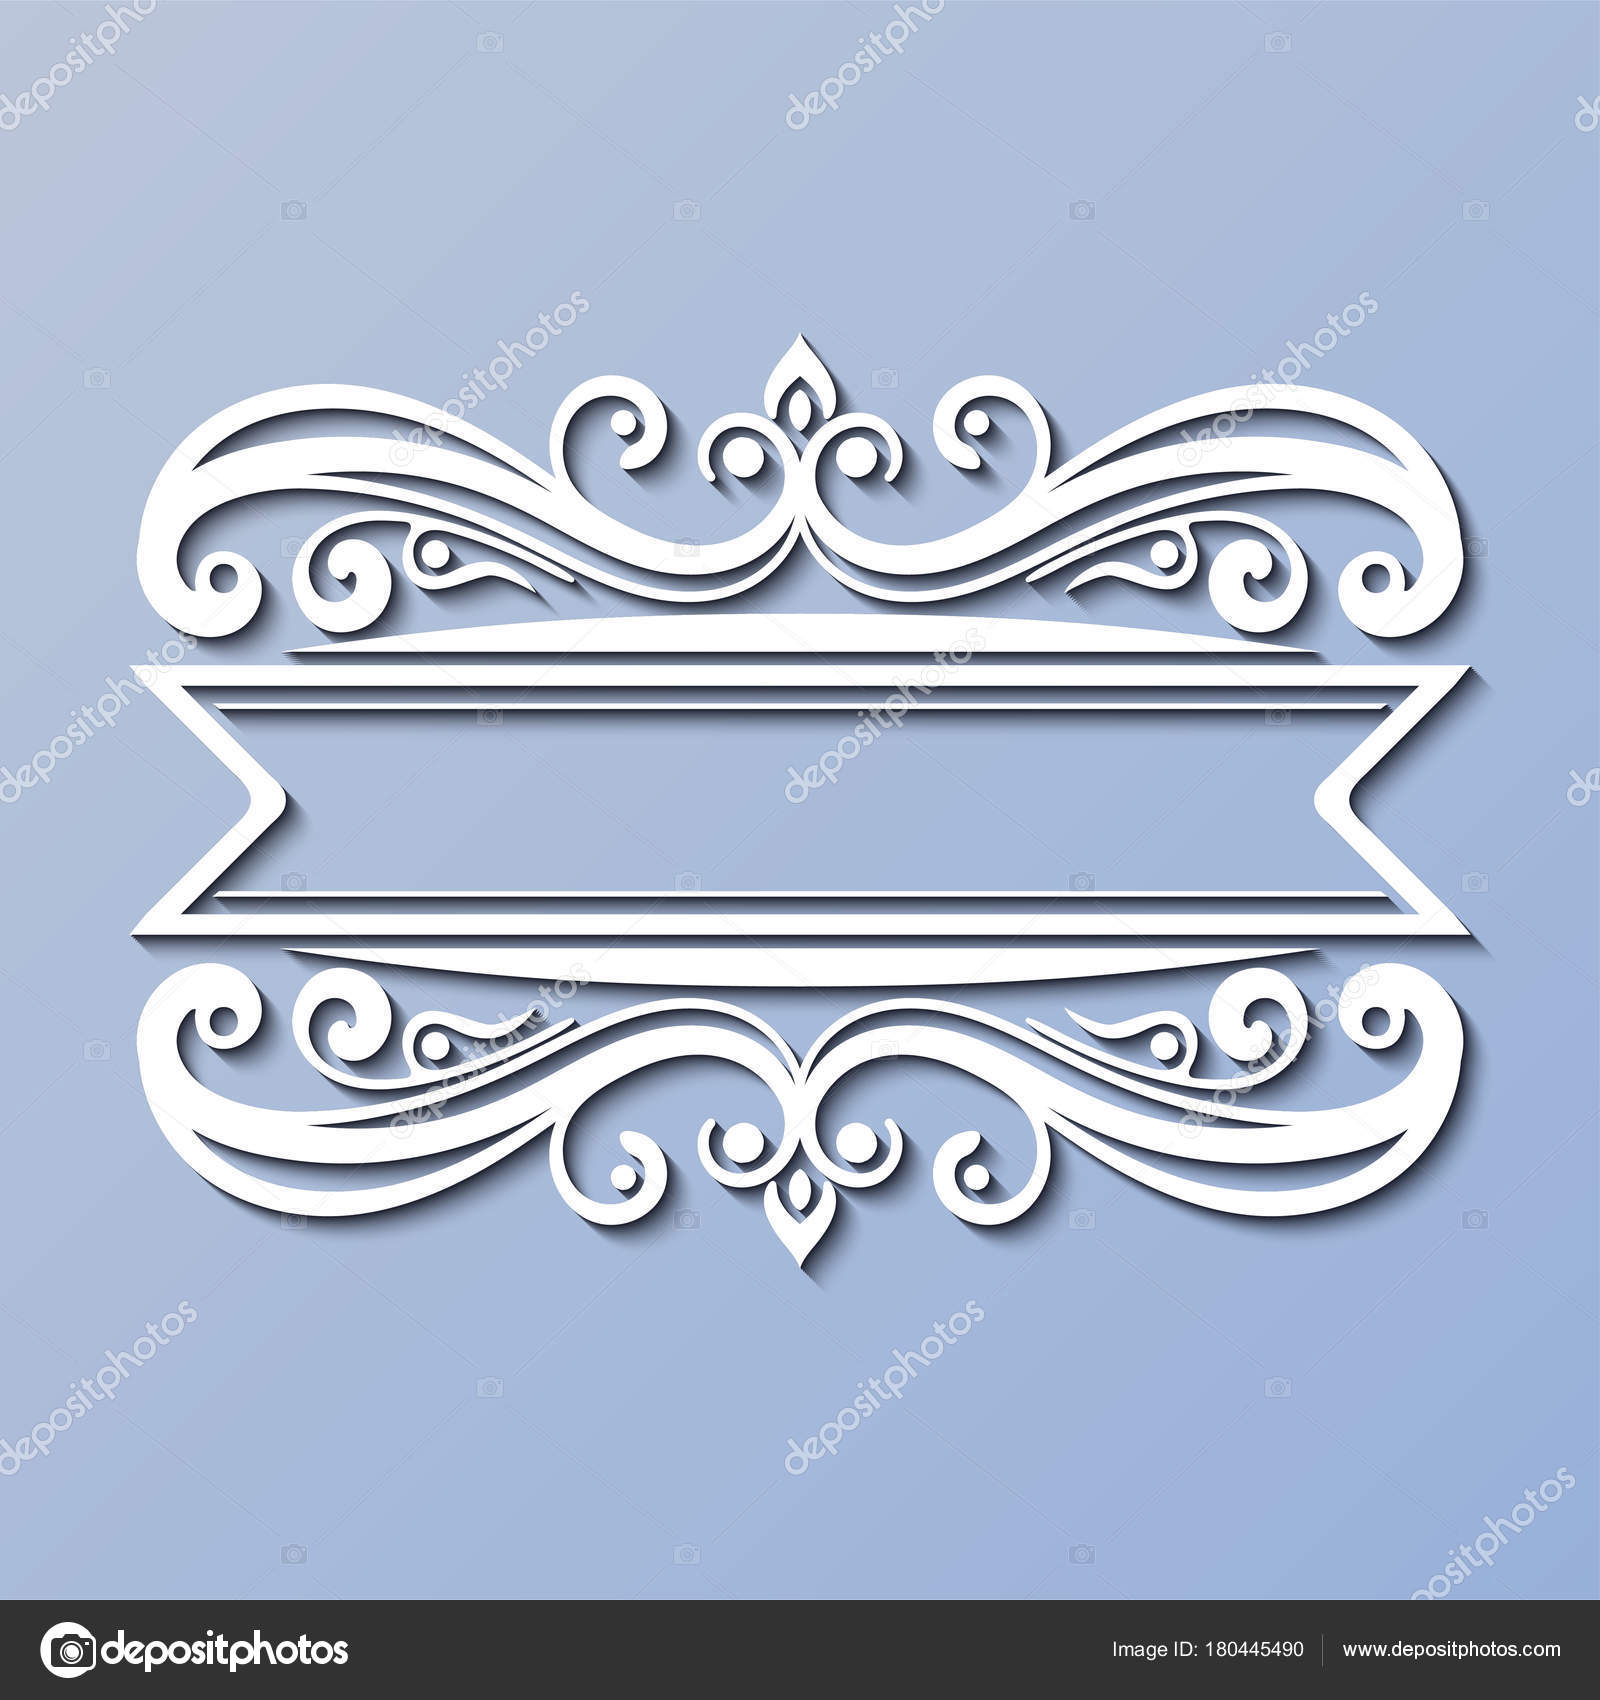 Vintage Calligraphic Label Ornate Logo Template For Design Of